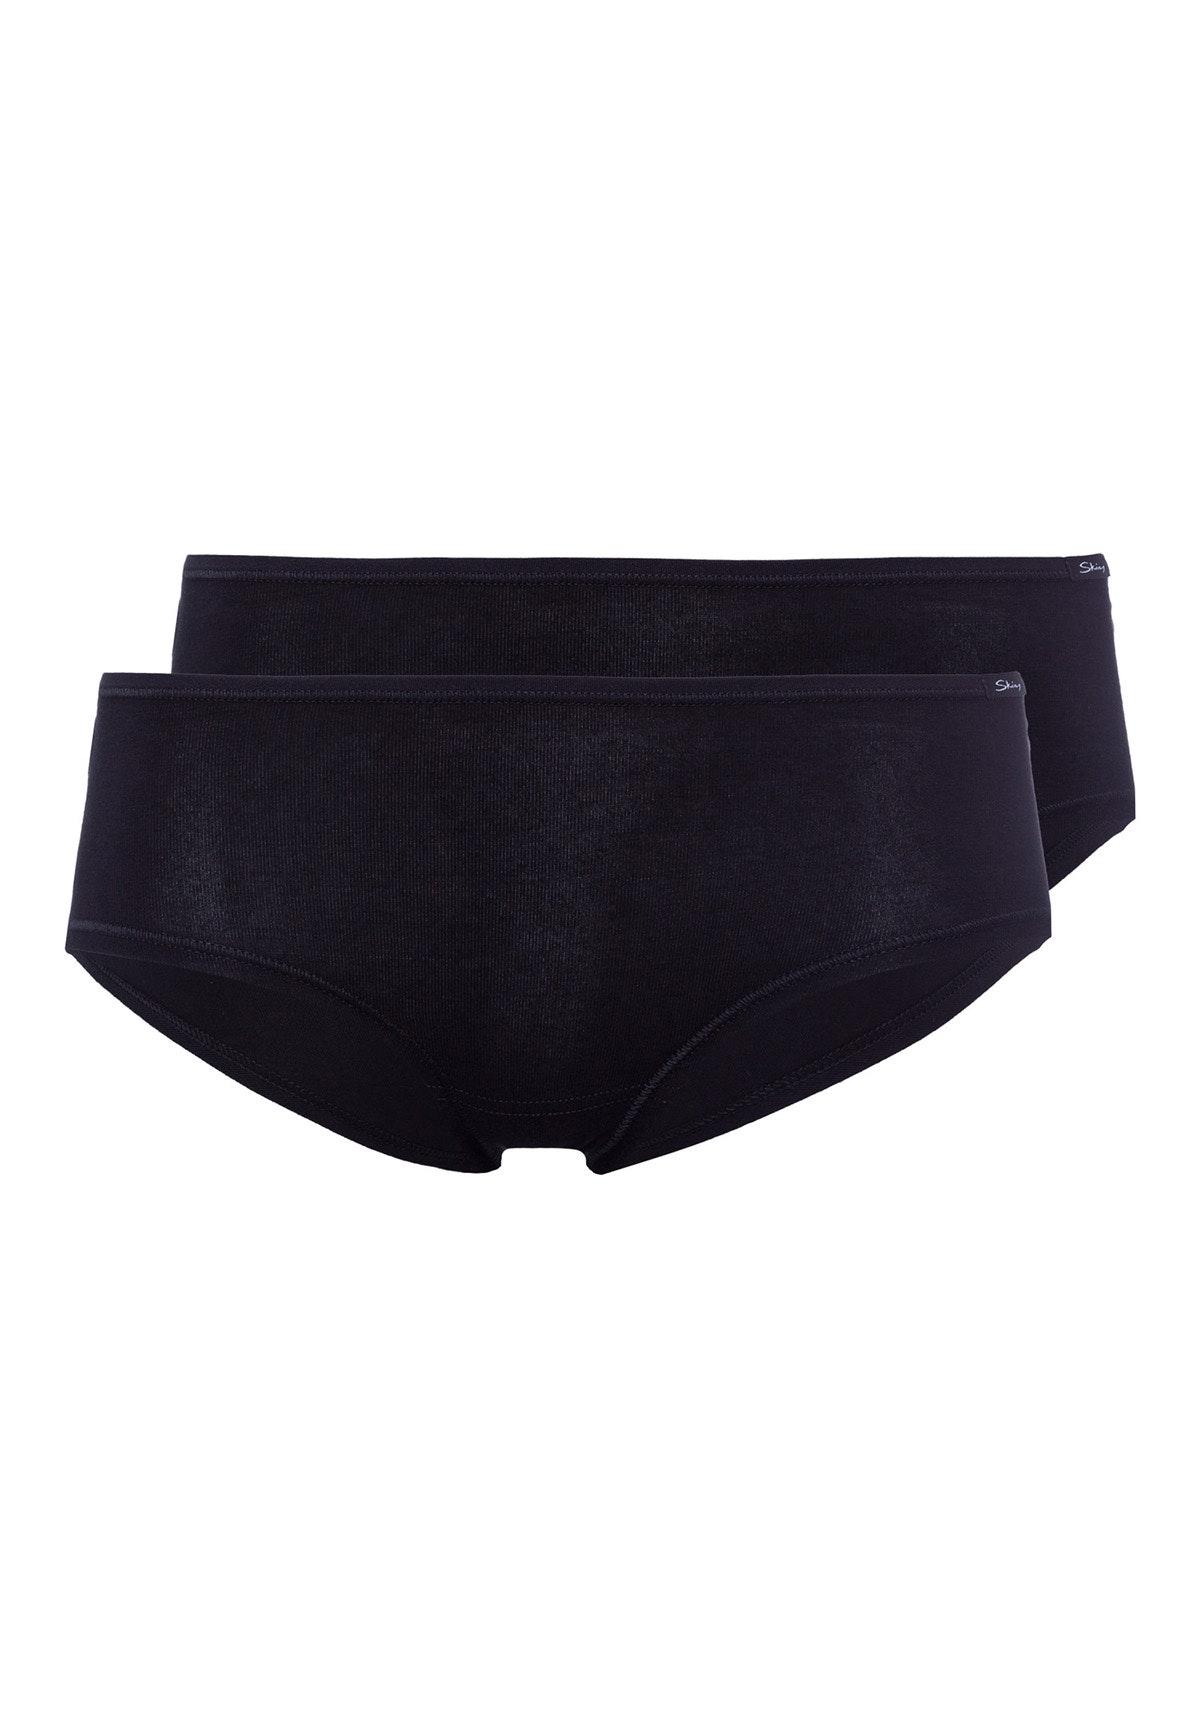 Advantage Cotton Panty 2er Pack